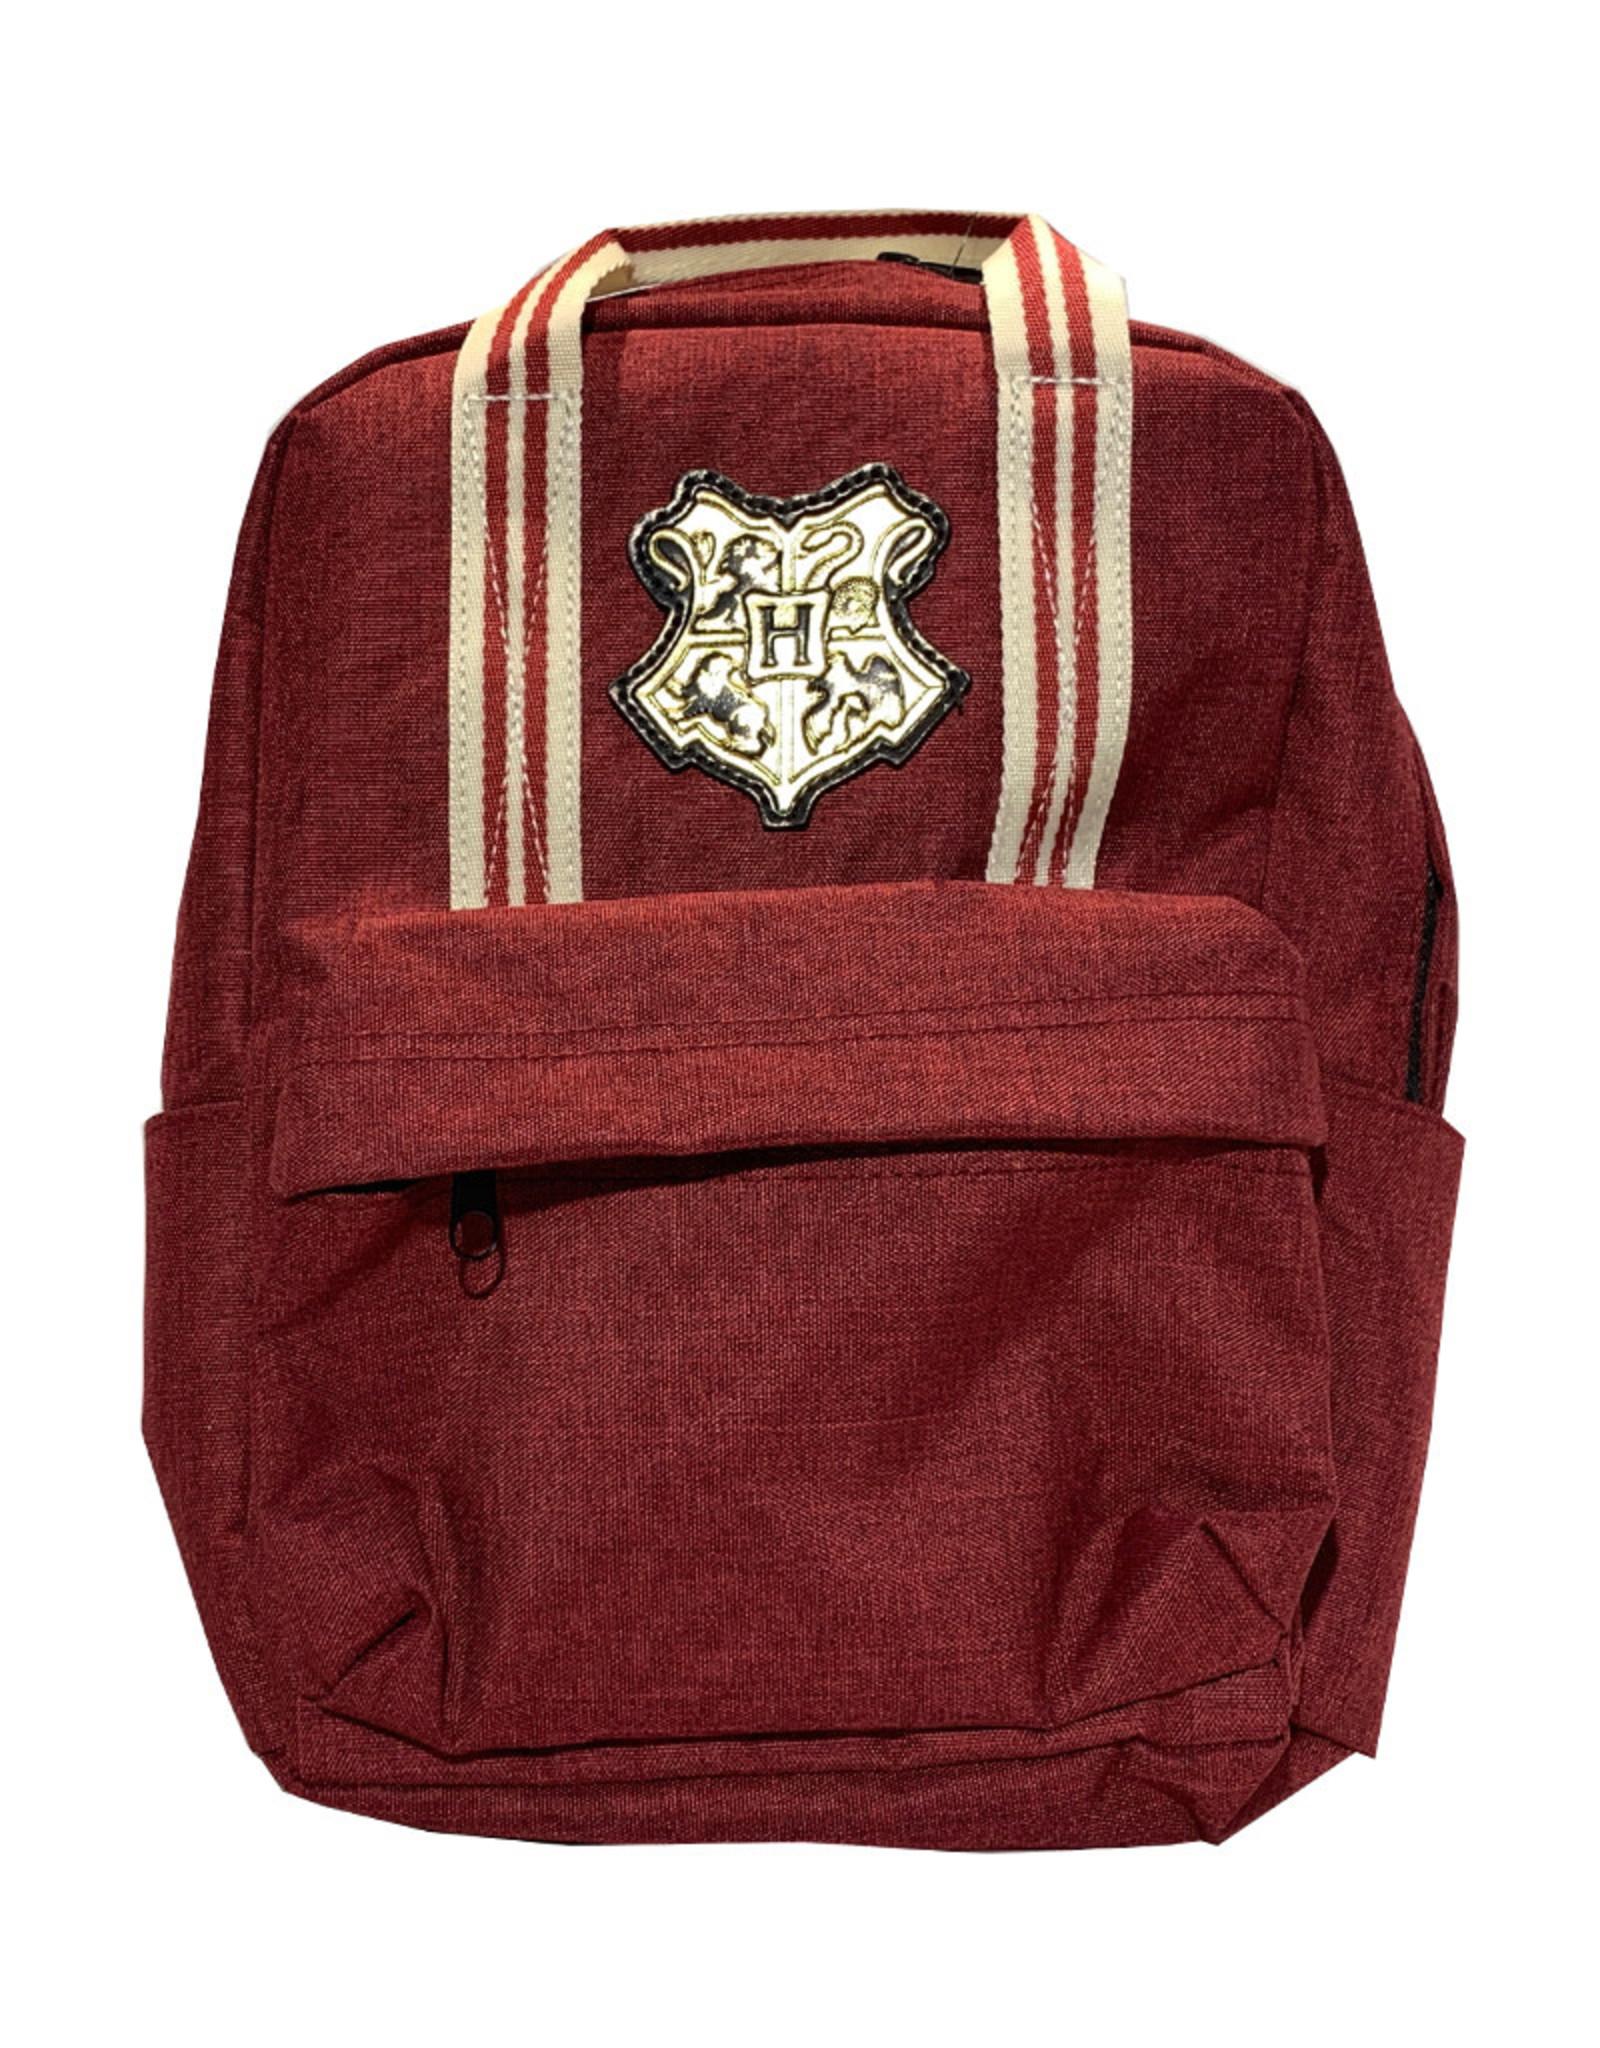 Harry Potter Harry Potter ( Lunch box ) Hogwarts